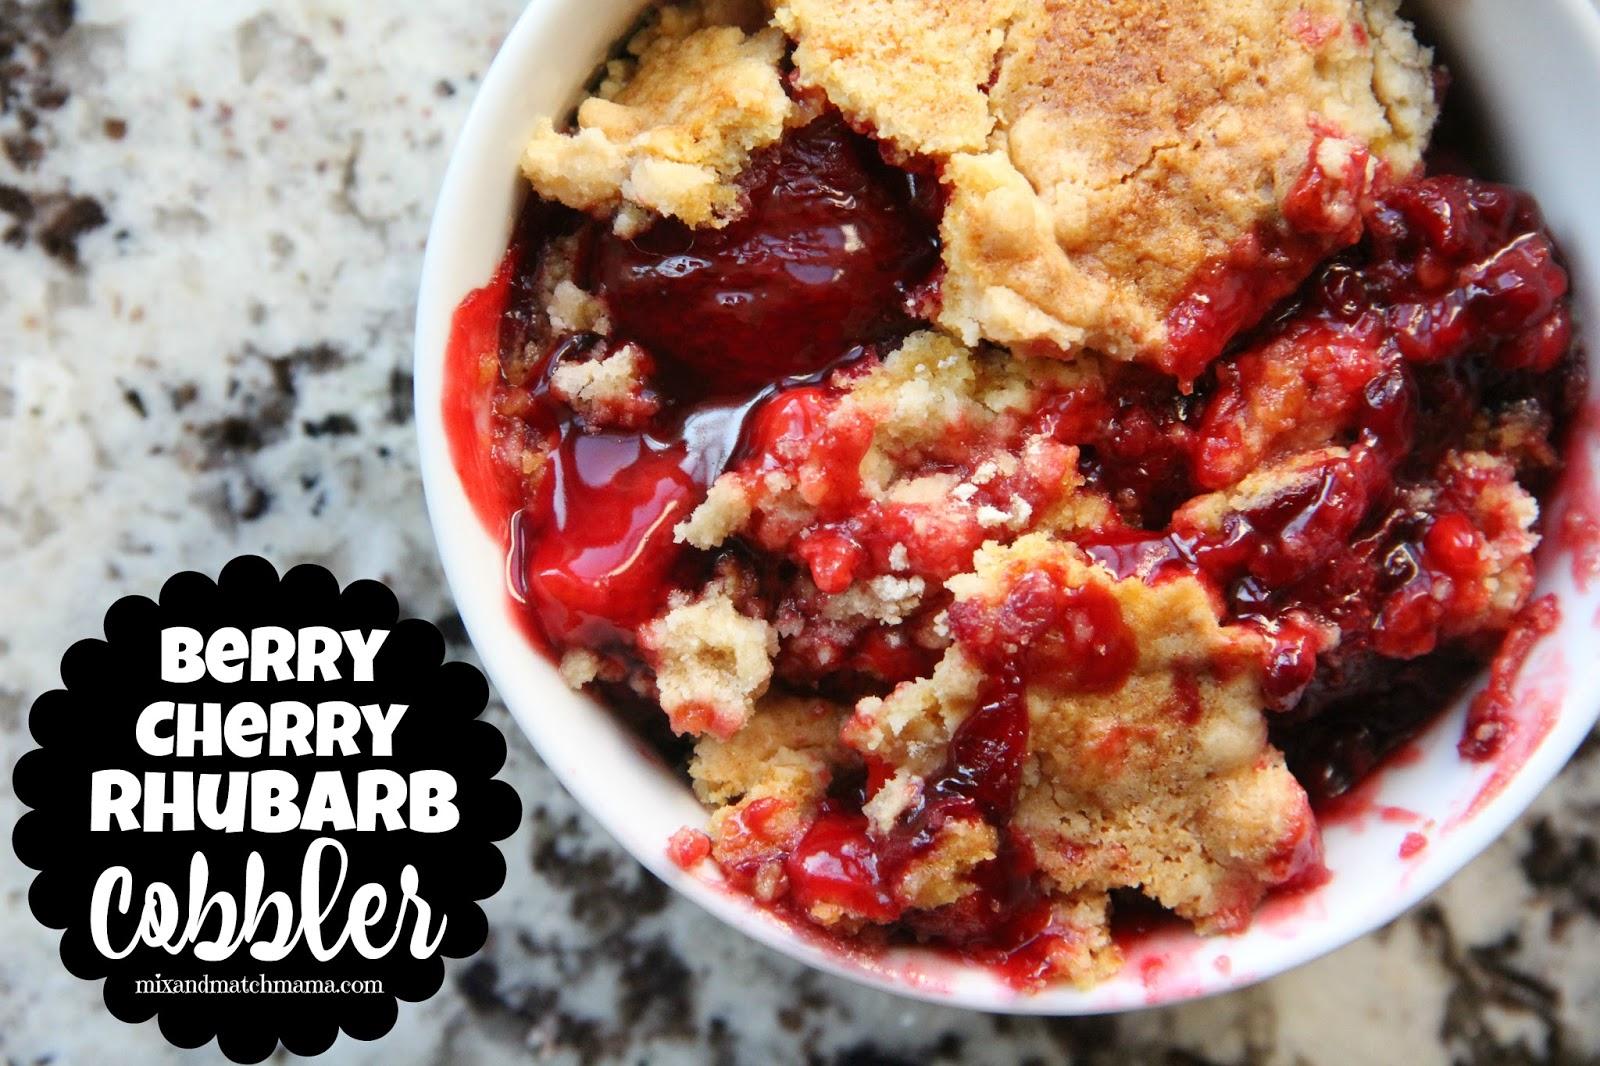 Berry Cherry Rhubarb Cobbler Mix And Match Mama